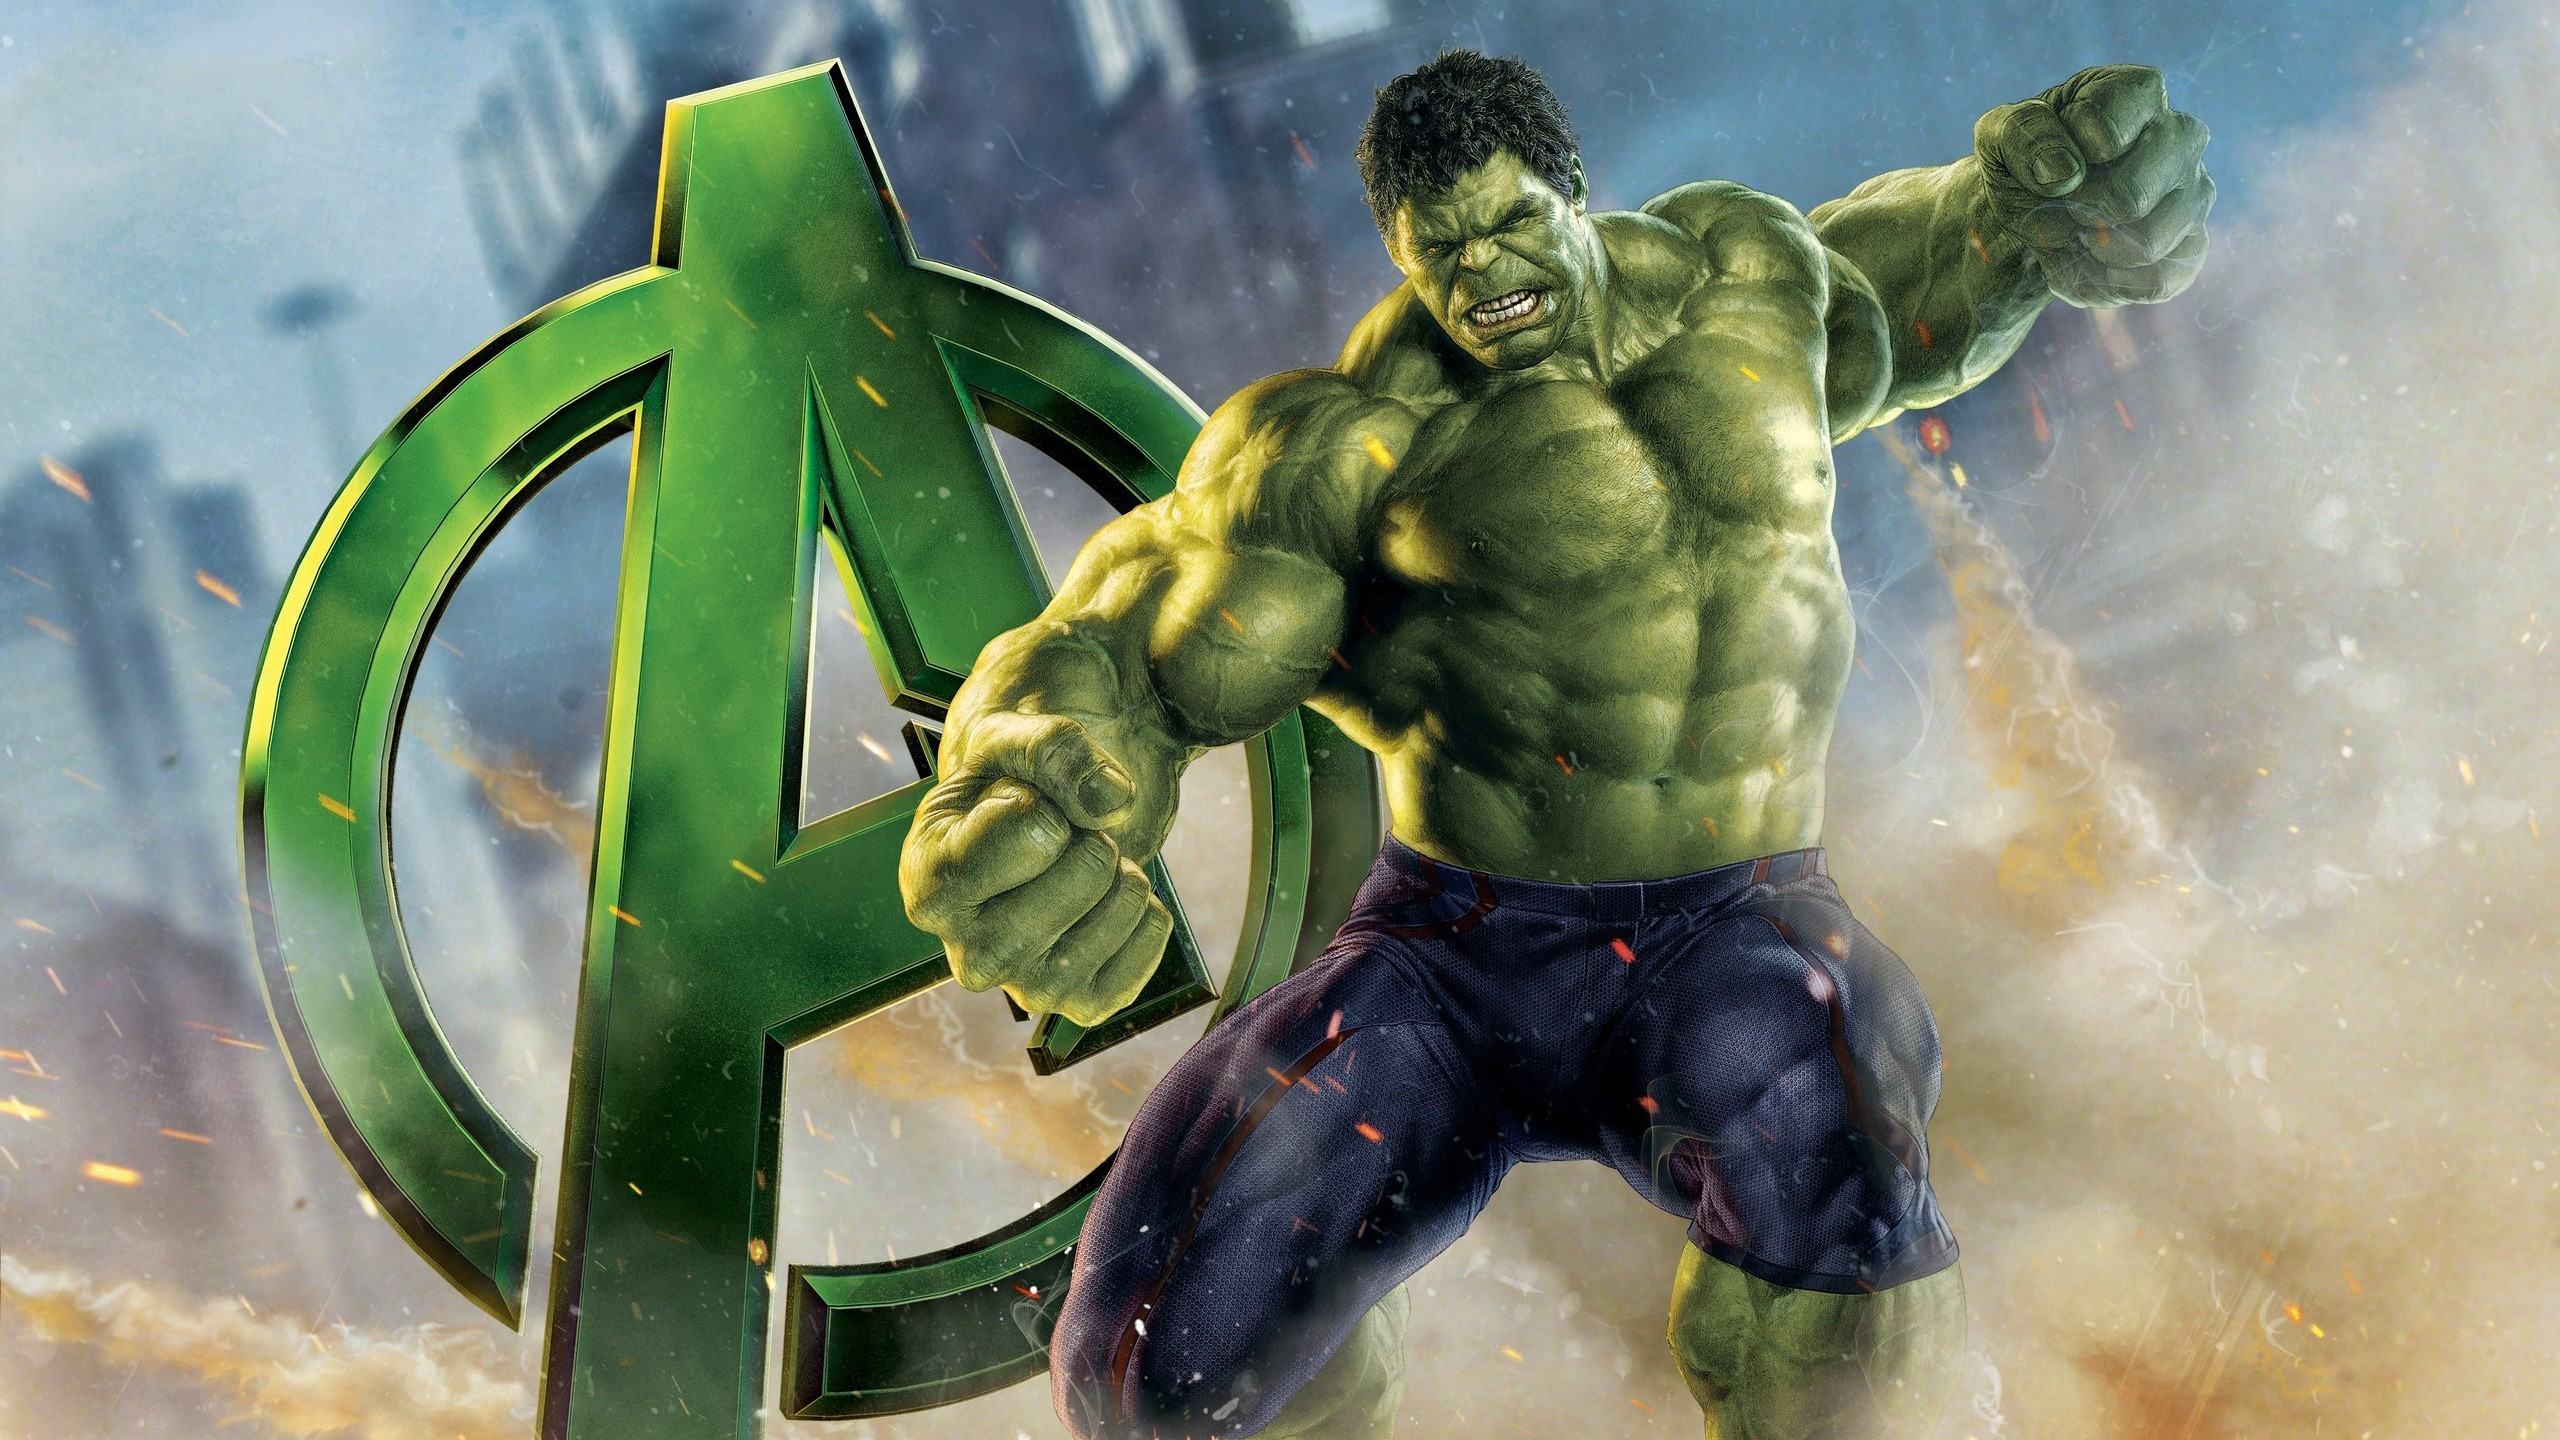 … x 1440 Original. Description: Download Avengers Hulk Movies wallpaper  …